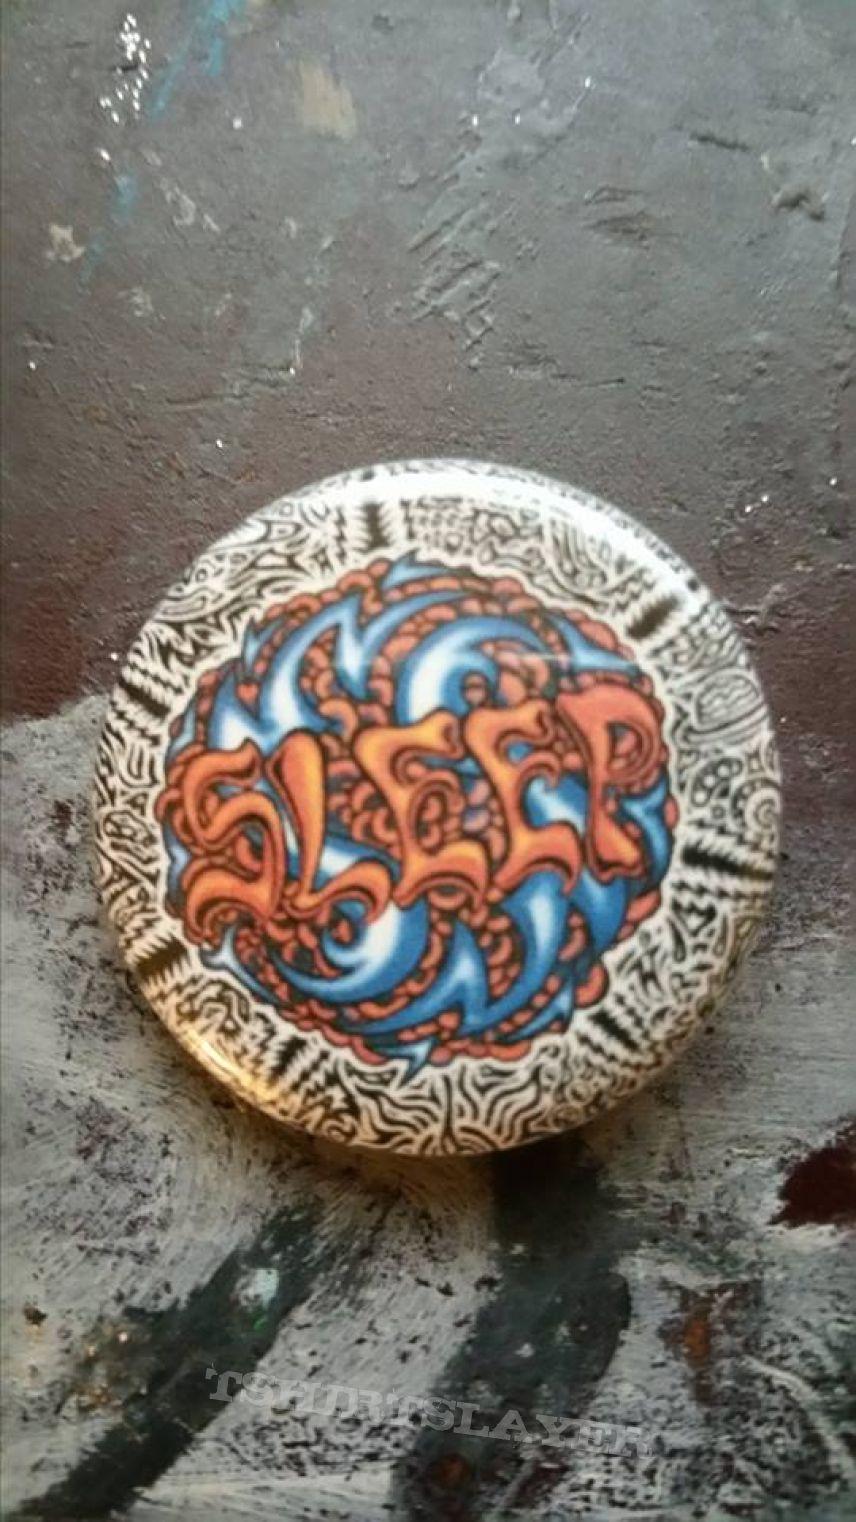 Sleep Holy mountain button | TShirtSlayer TShirt and